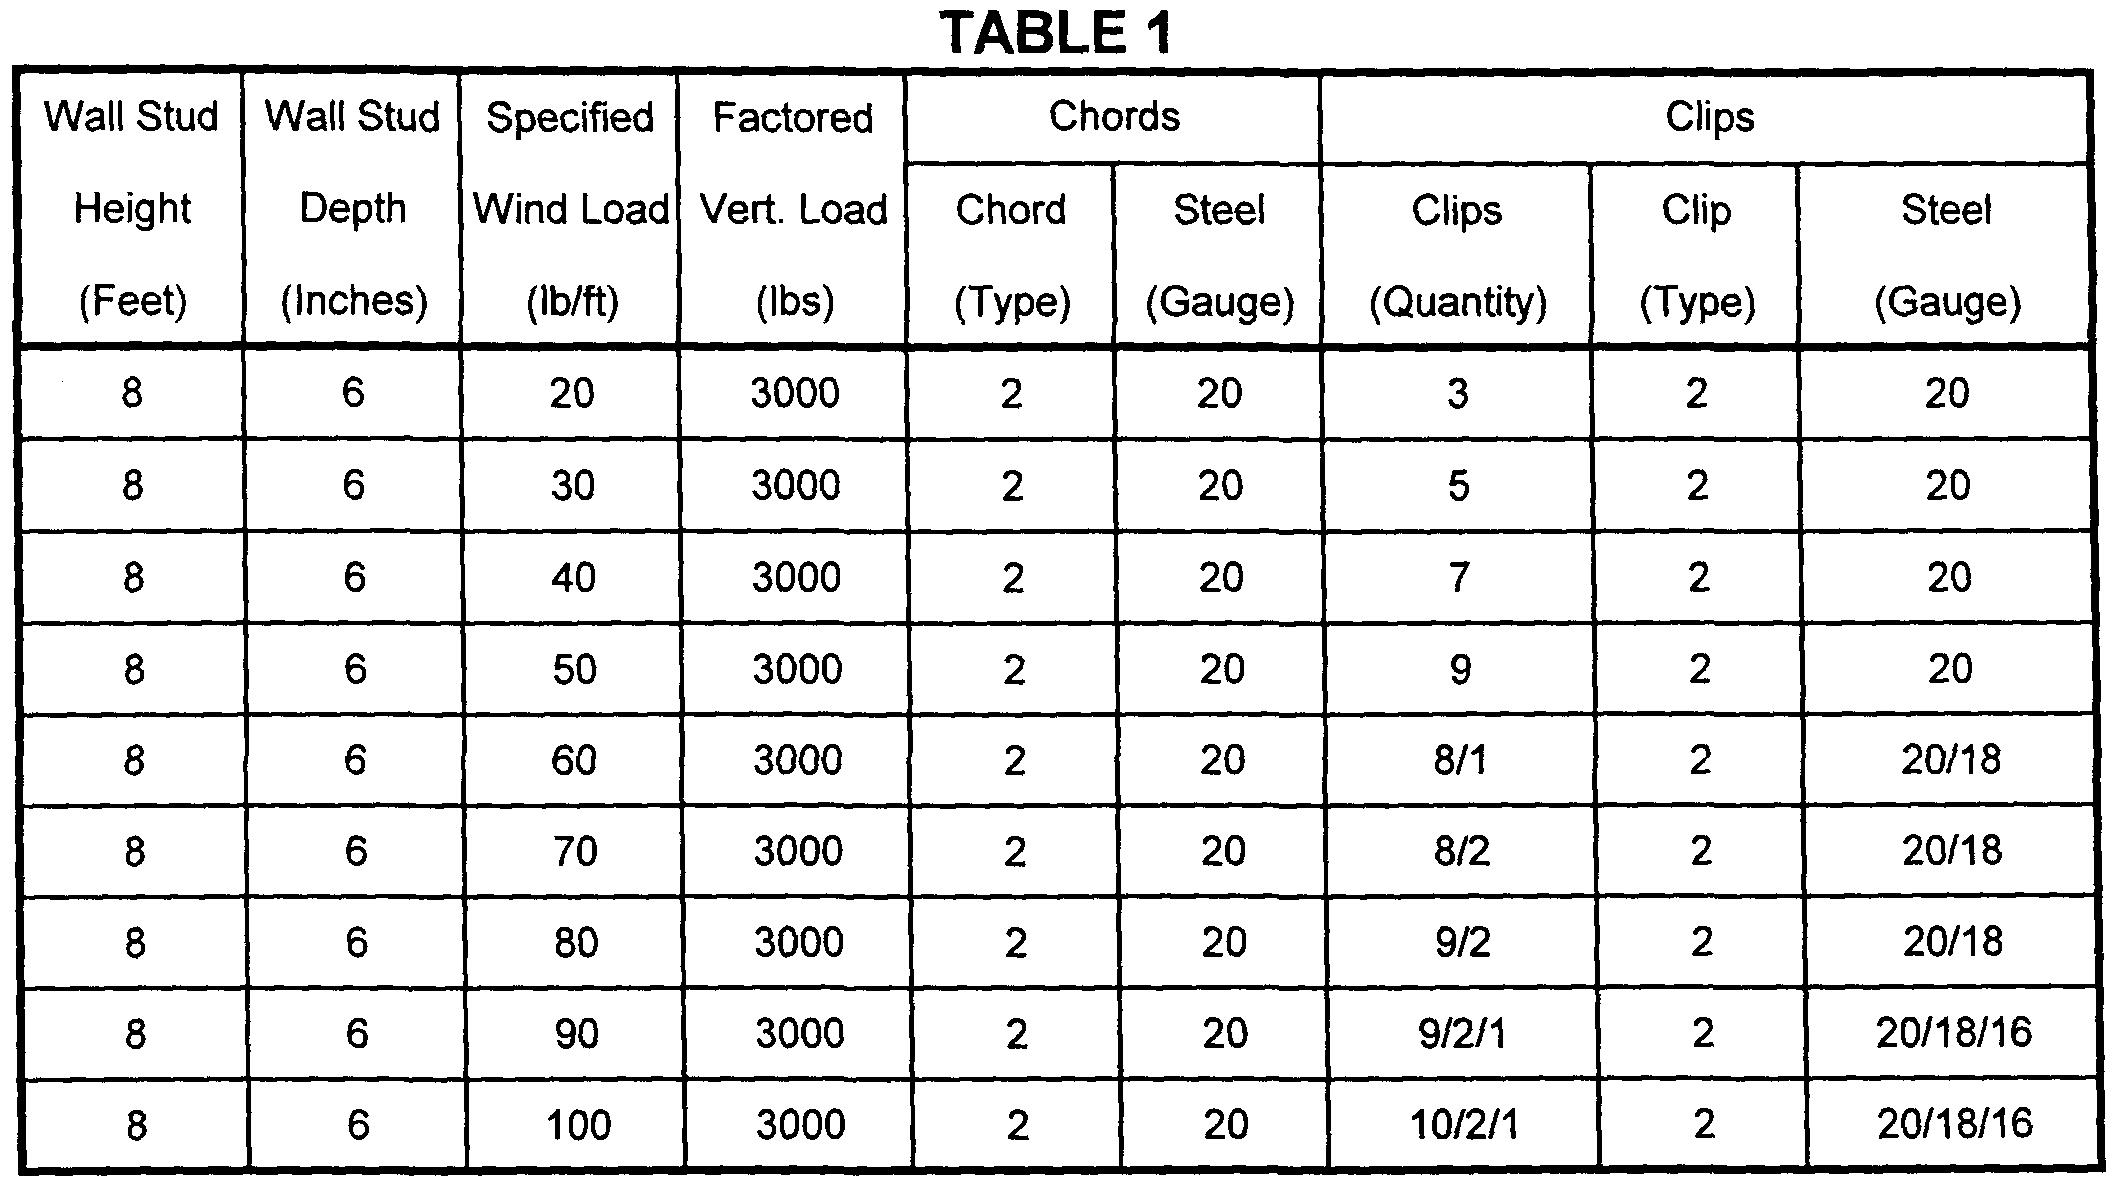 Wood Beam Span Tables Residential Steel Joist Tables Wood Floor Truss Span  Tables     Sc 1 St Carpet Vidalondon. Roofing Span Tables   Metal Roof Rafter Span Tables Sc 1 St Pinterest